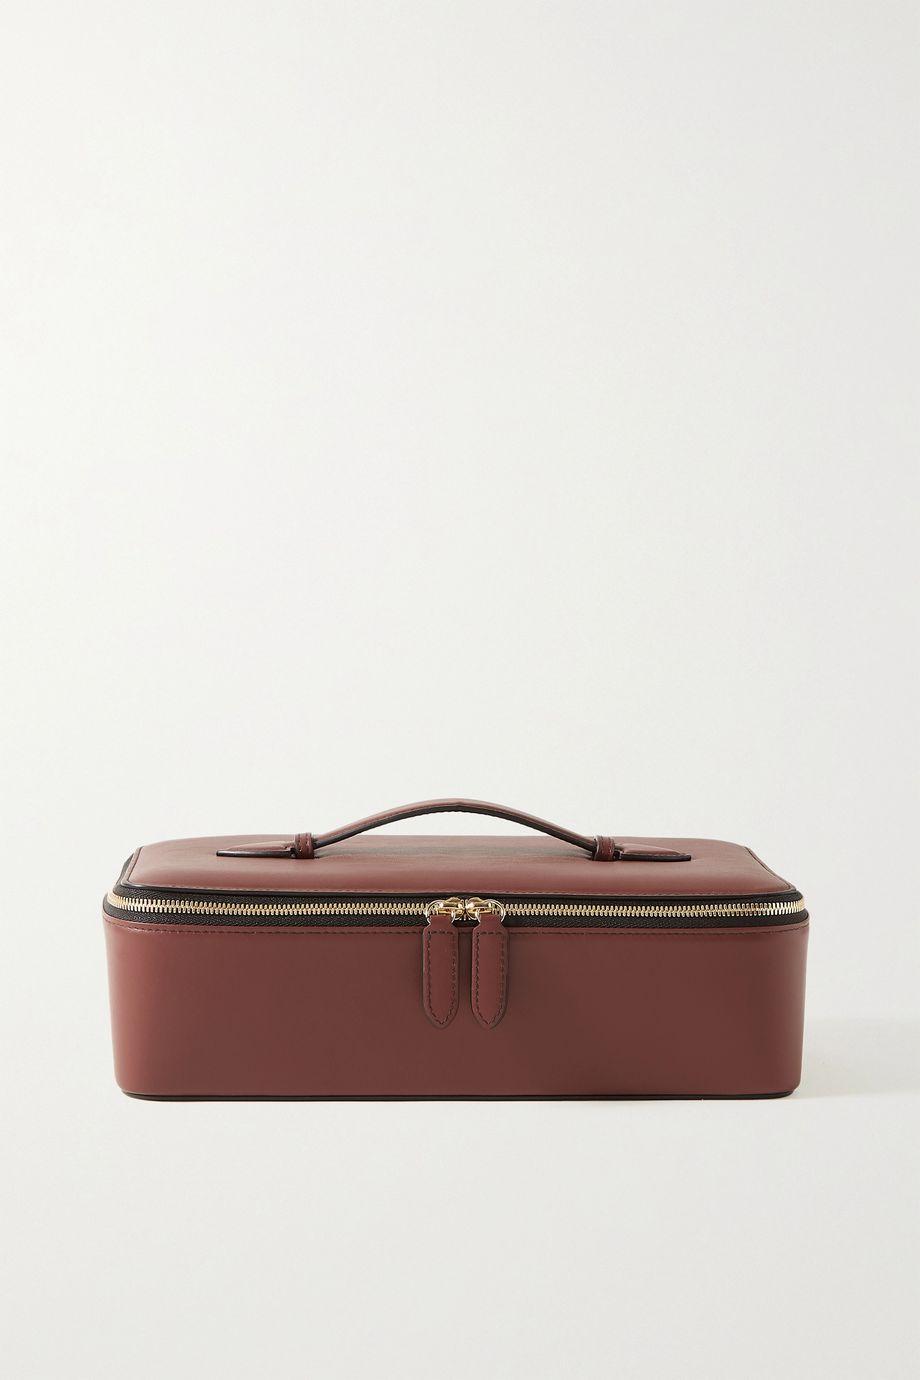 Smythson Leather jewelry case